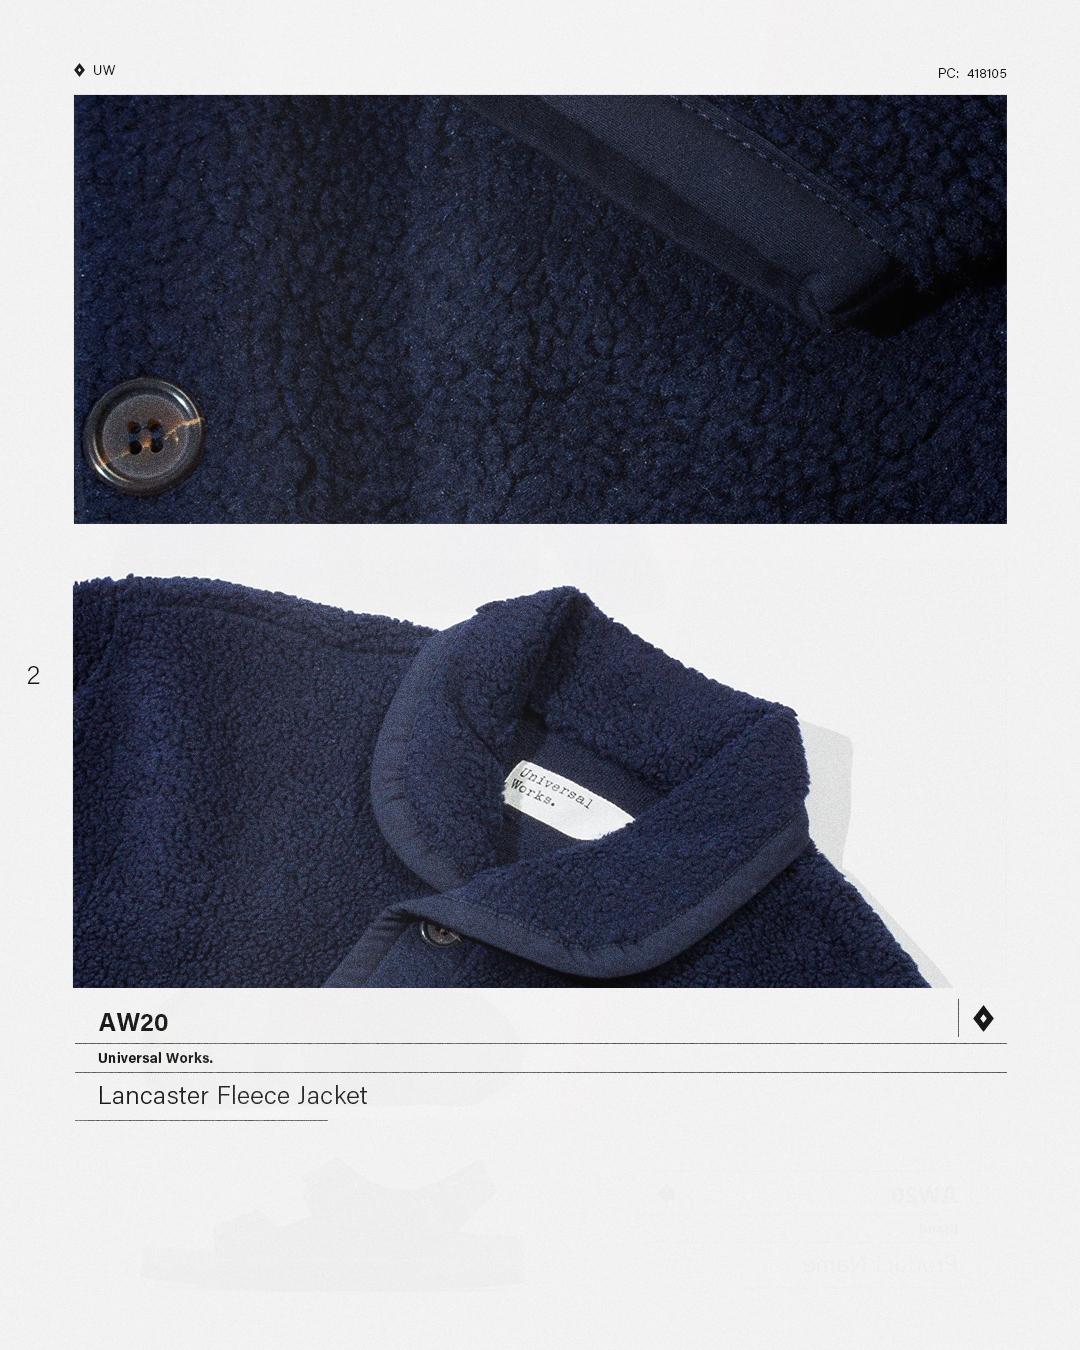 HIP Staff Picks: Universal Works AW20 Lancaster Fleece